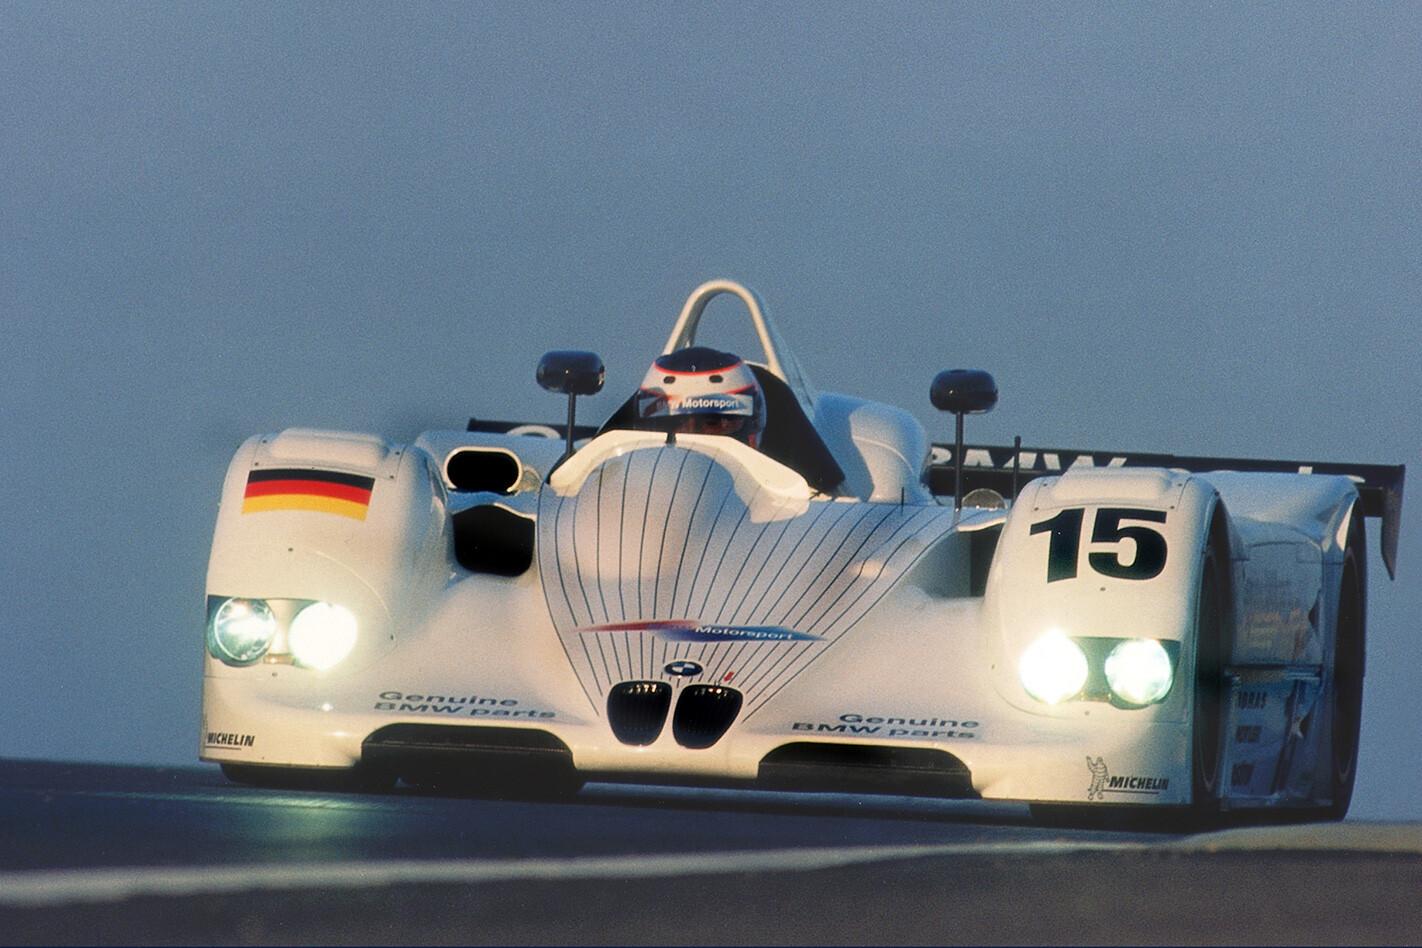 BMW LMR V12